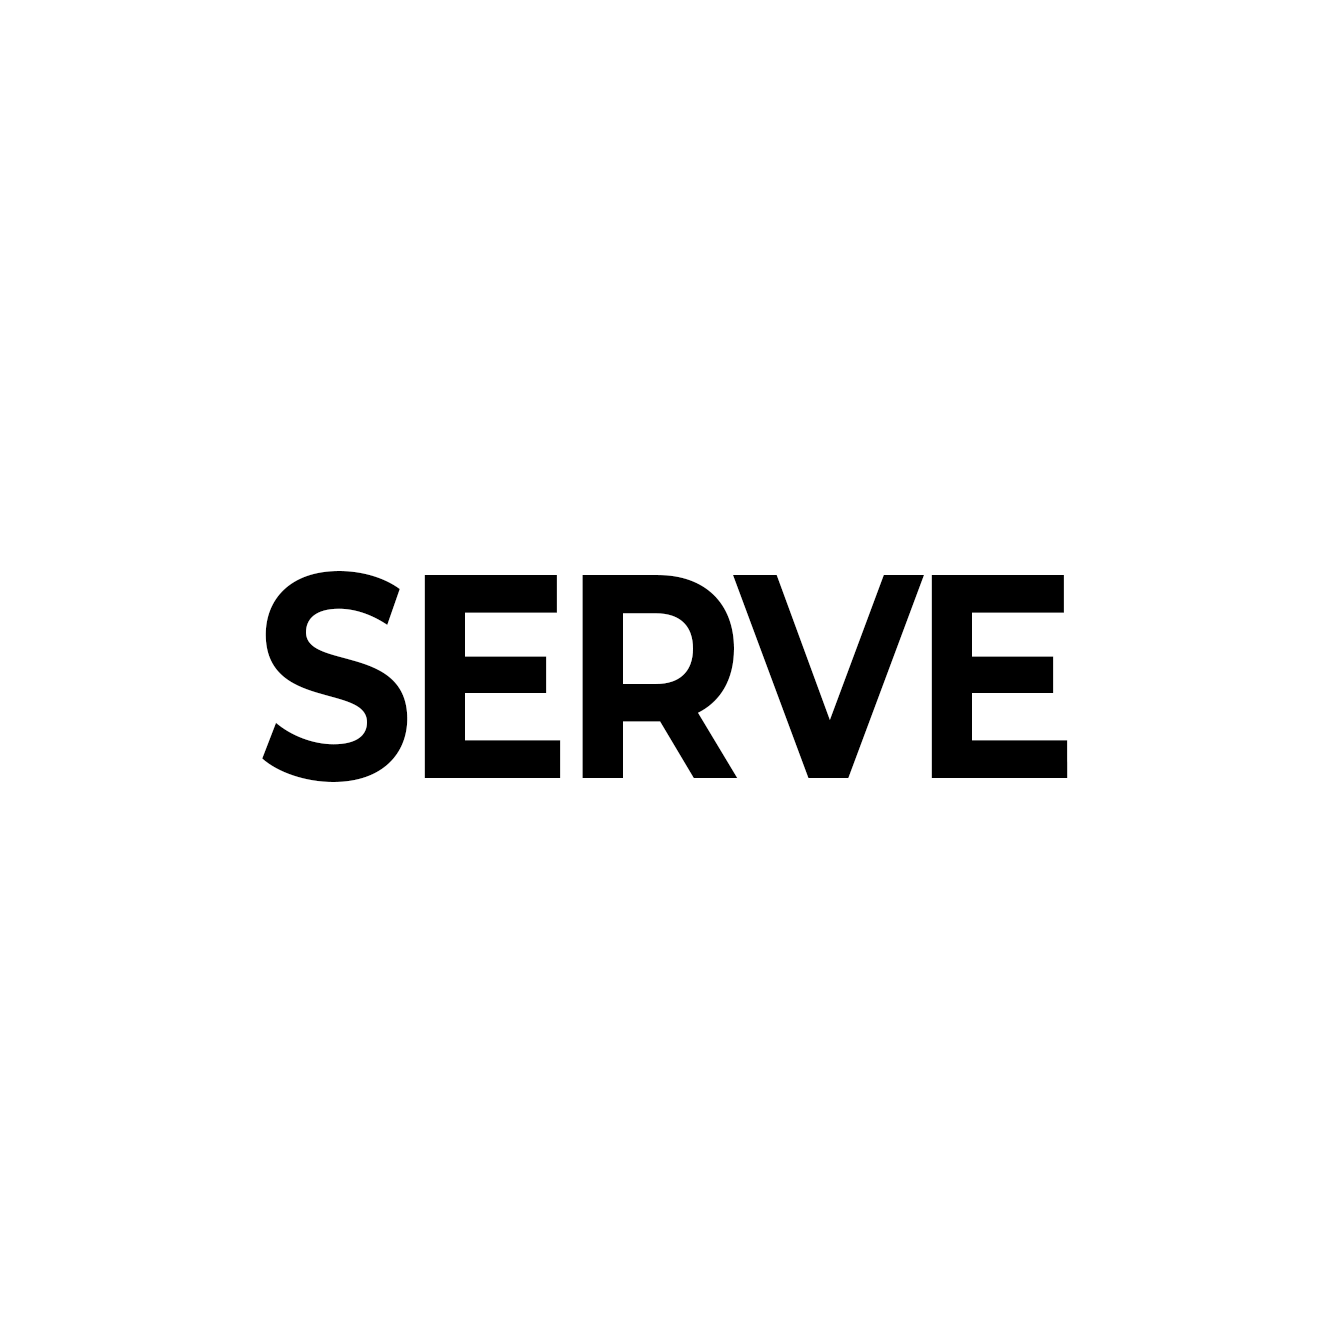 serve white word